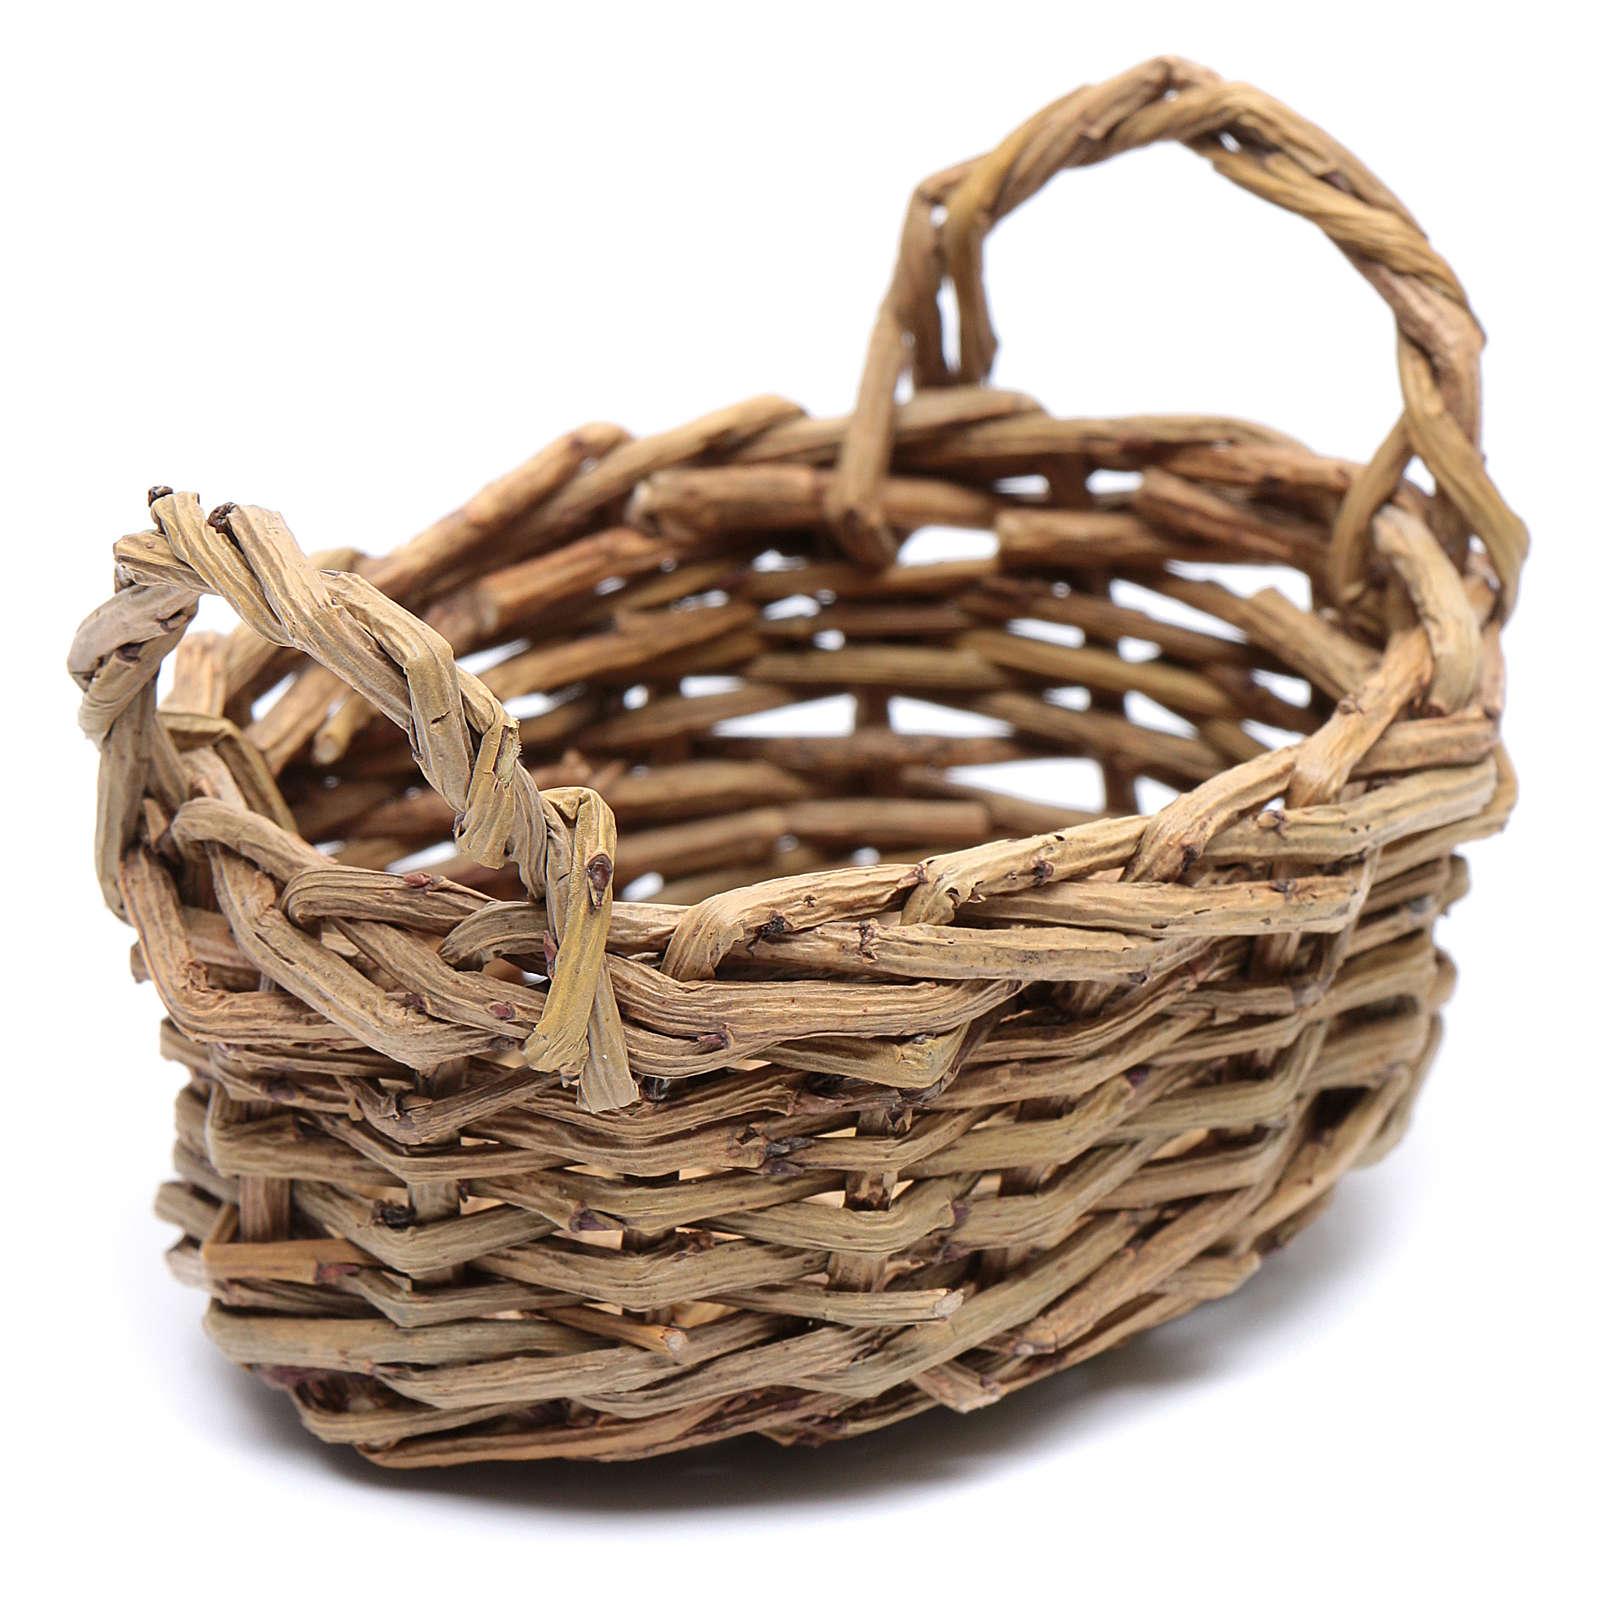 DIY nativity scene wicker basket for laundry 6x6x9 cm 4